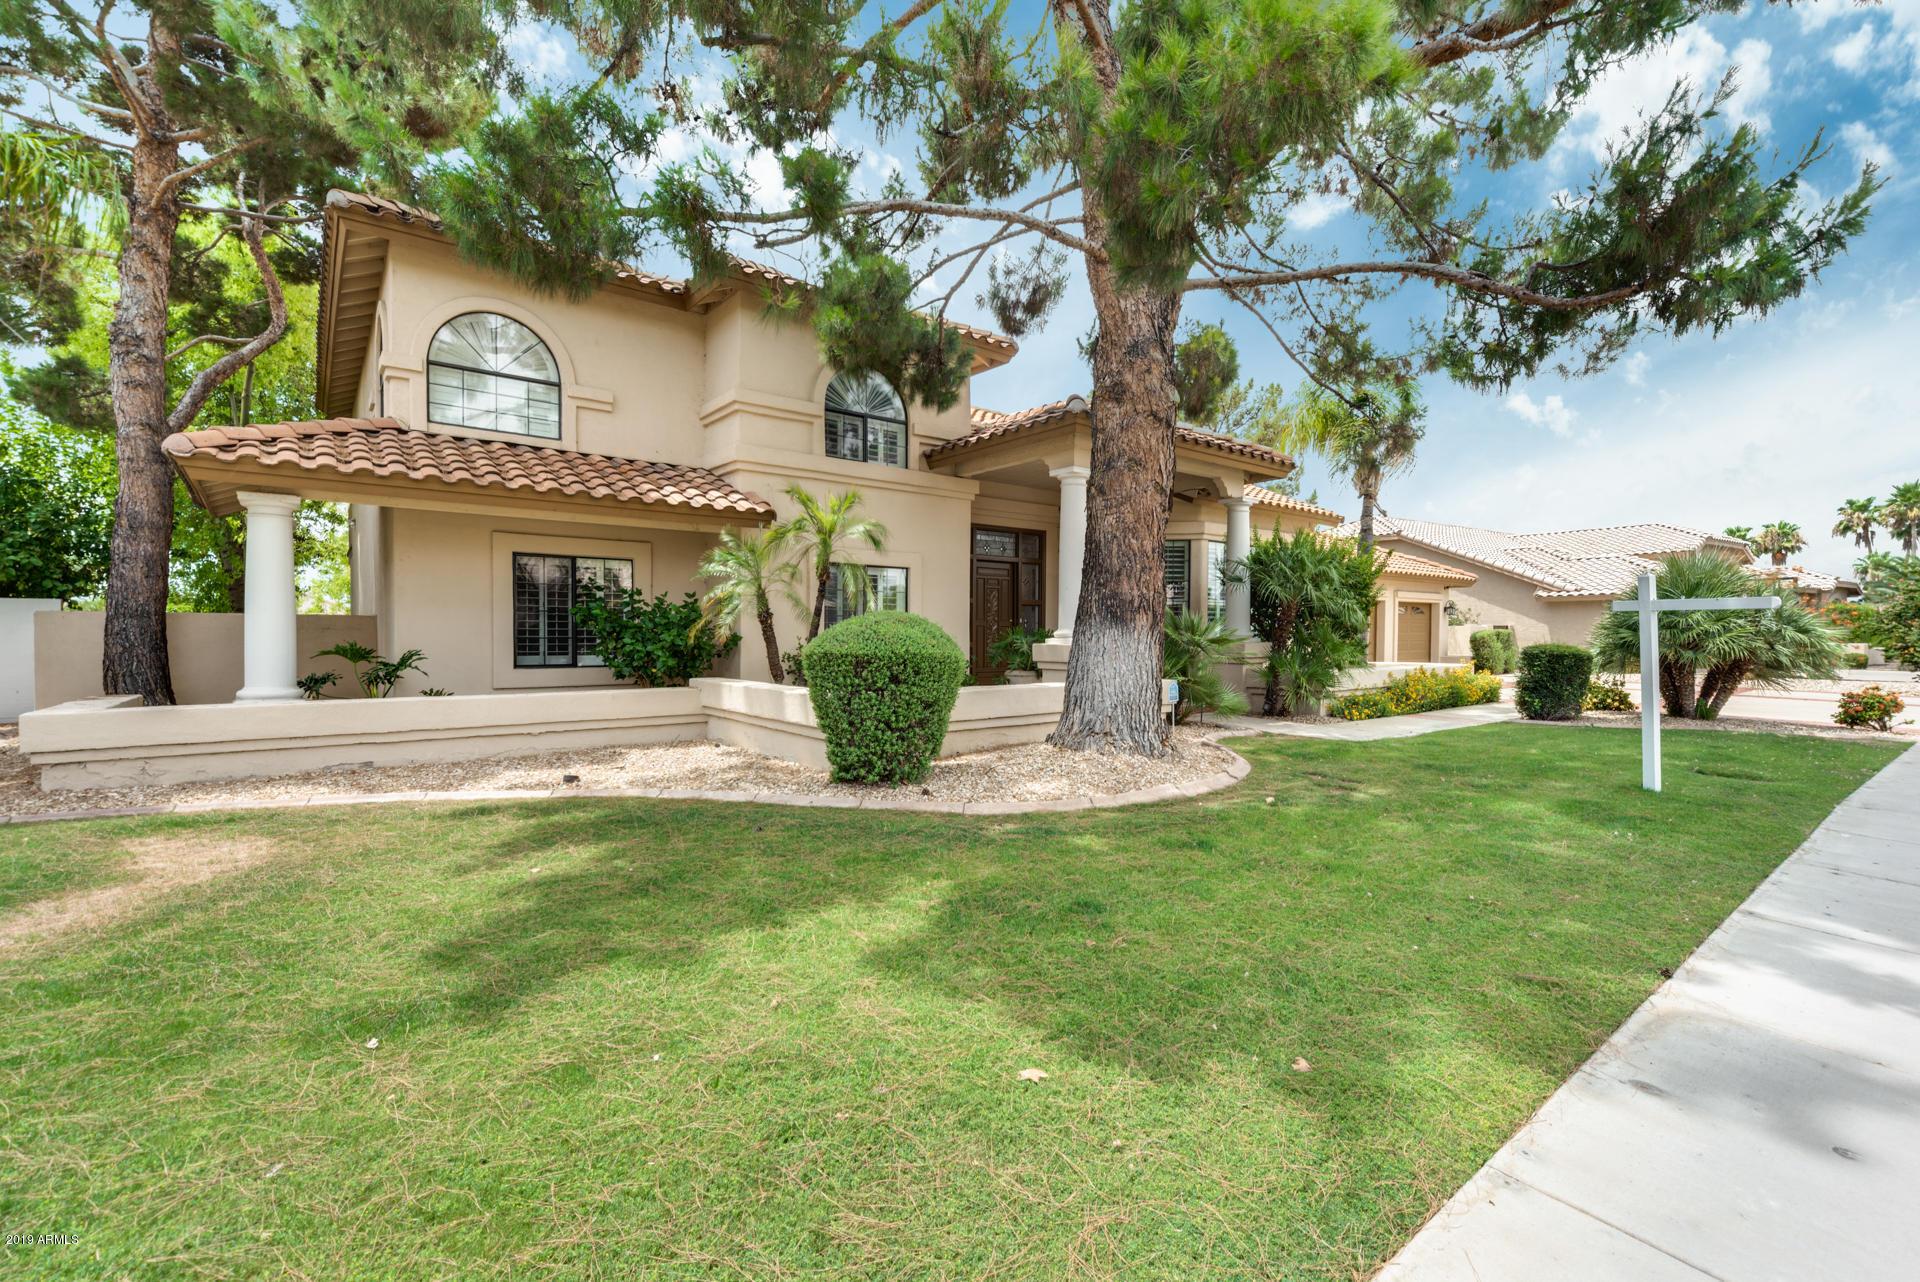 Photo of 6121 W ROSE GARDEN Lane, Glendale, AZ 85308